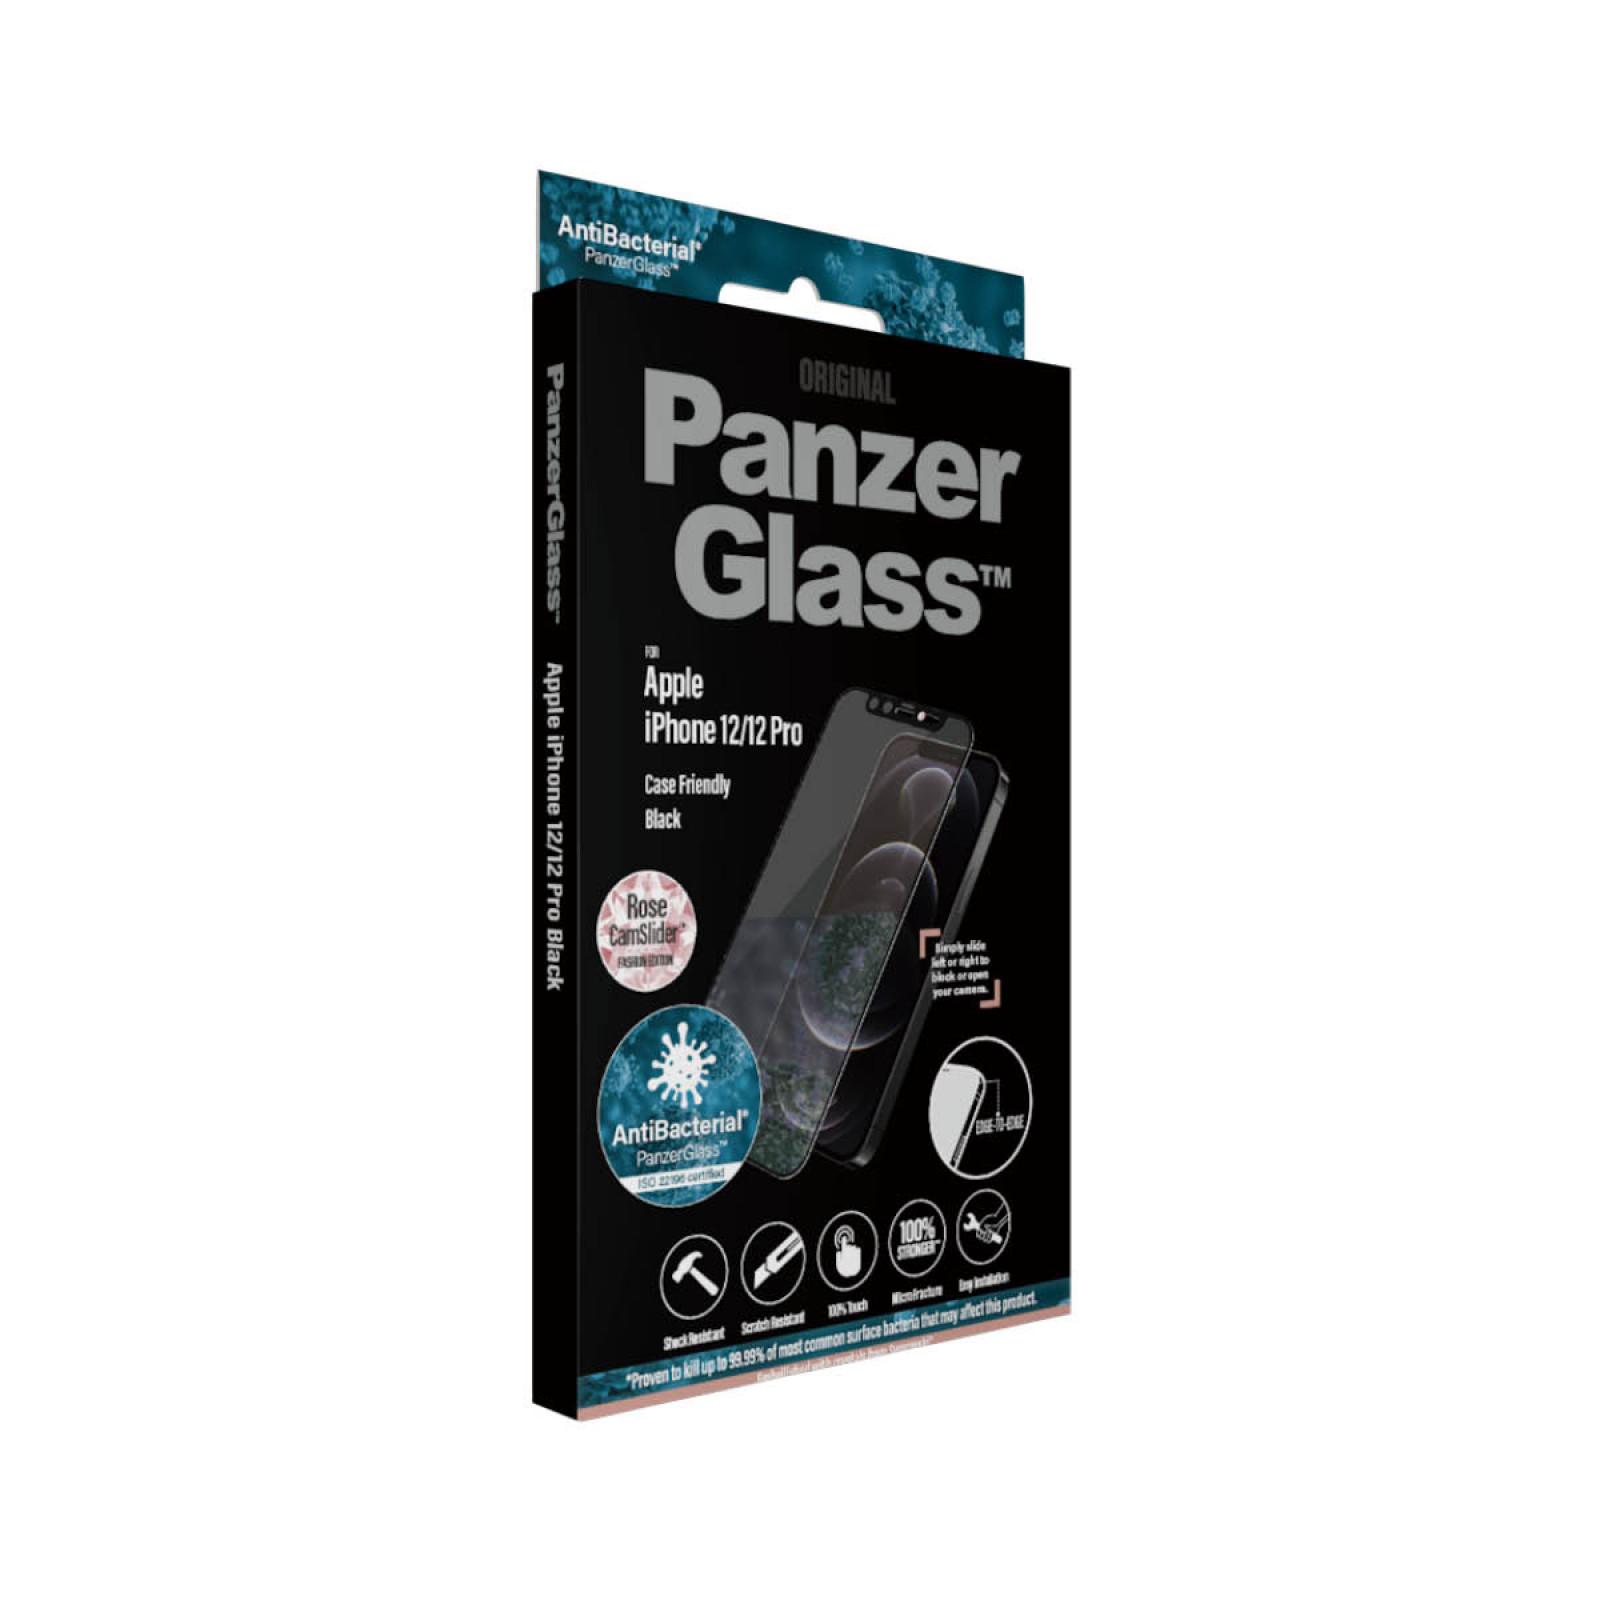 Стъклен протектор PanzerGlass за Iphone 12 /12 Pro, CaseFriendly, CamSlaider, Swarovski Rose Edition